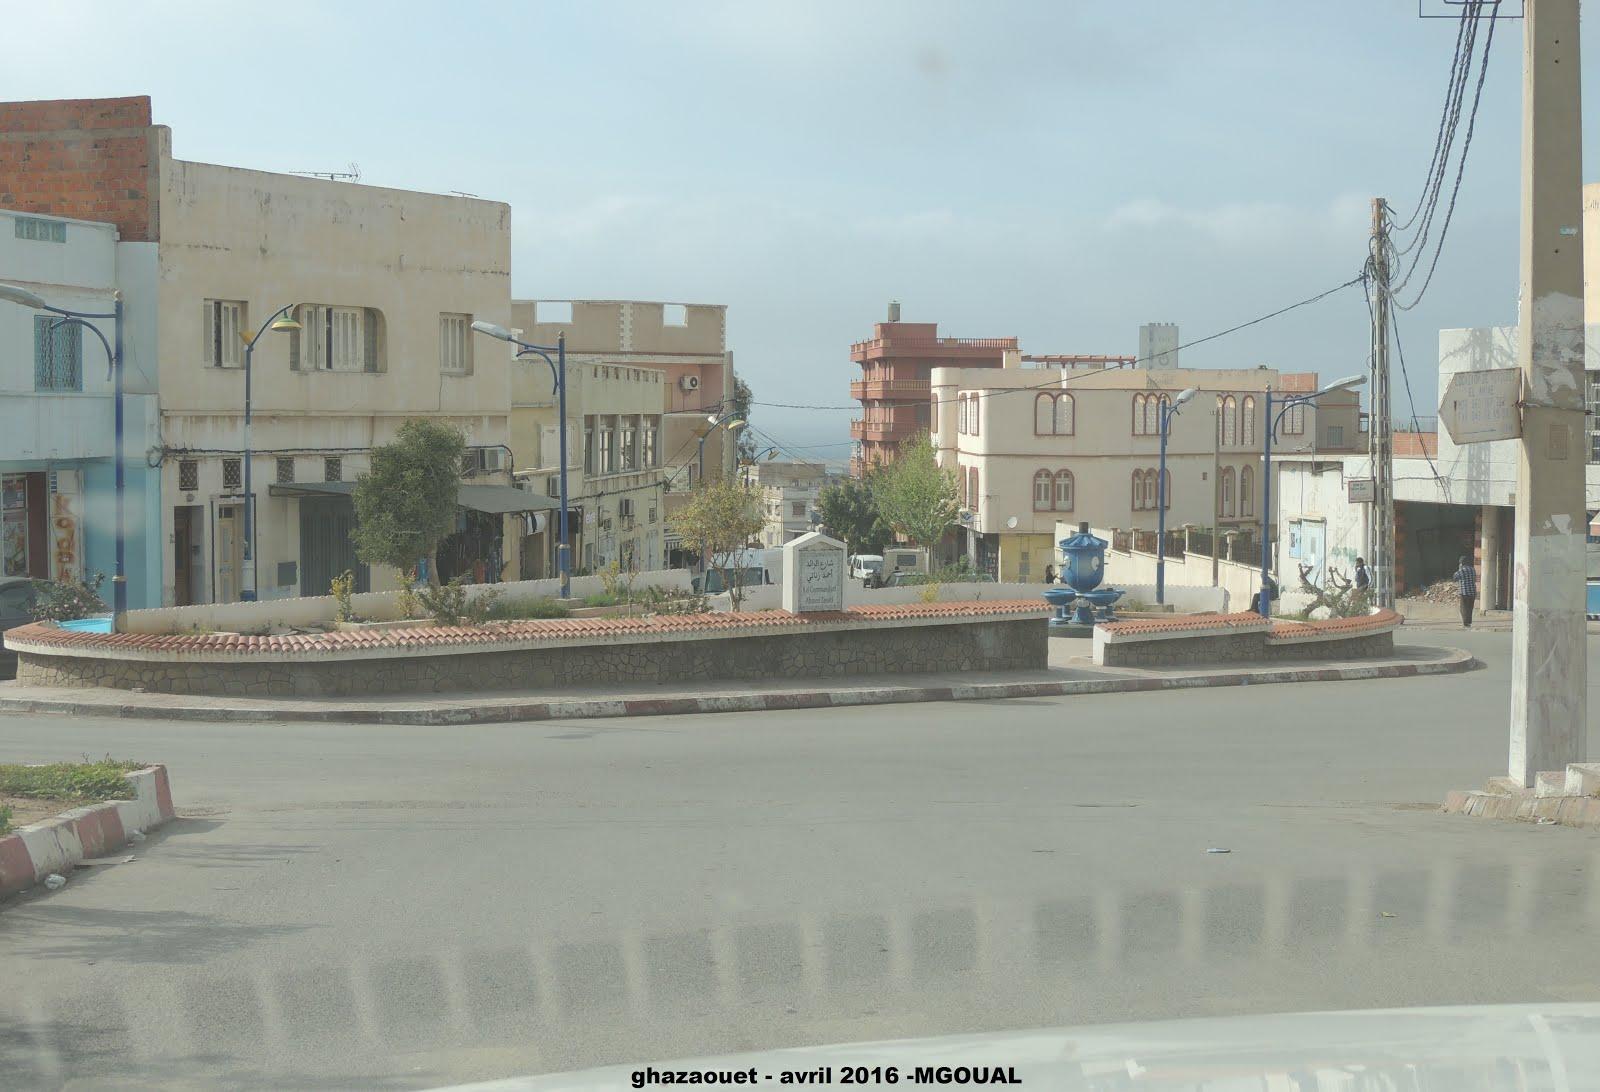 Ghazaouet - Wilaya Tlemcen